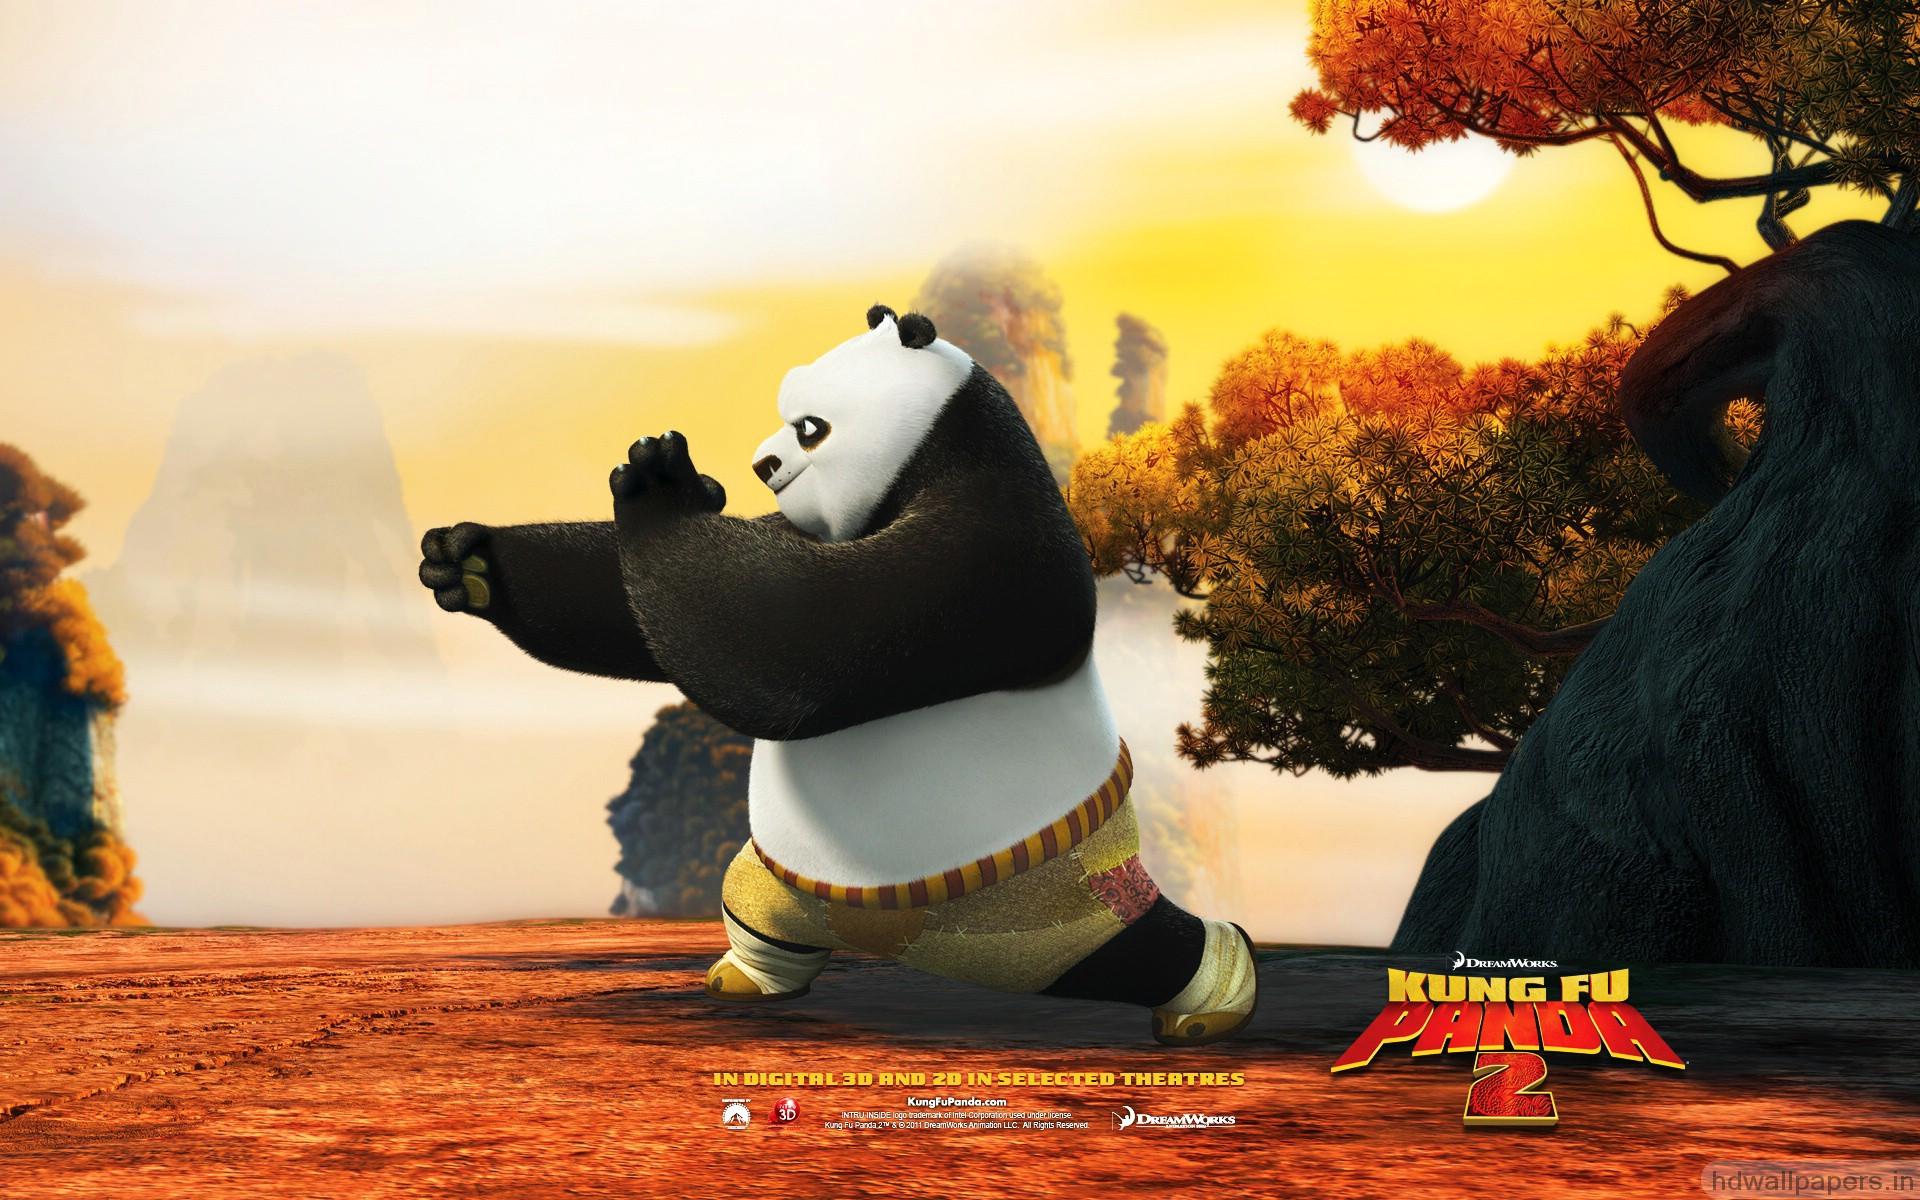 Po In Kung Fu Panda 2 Hd Wallpaper